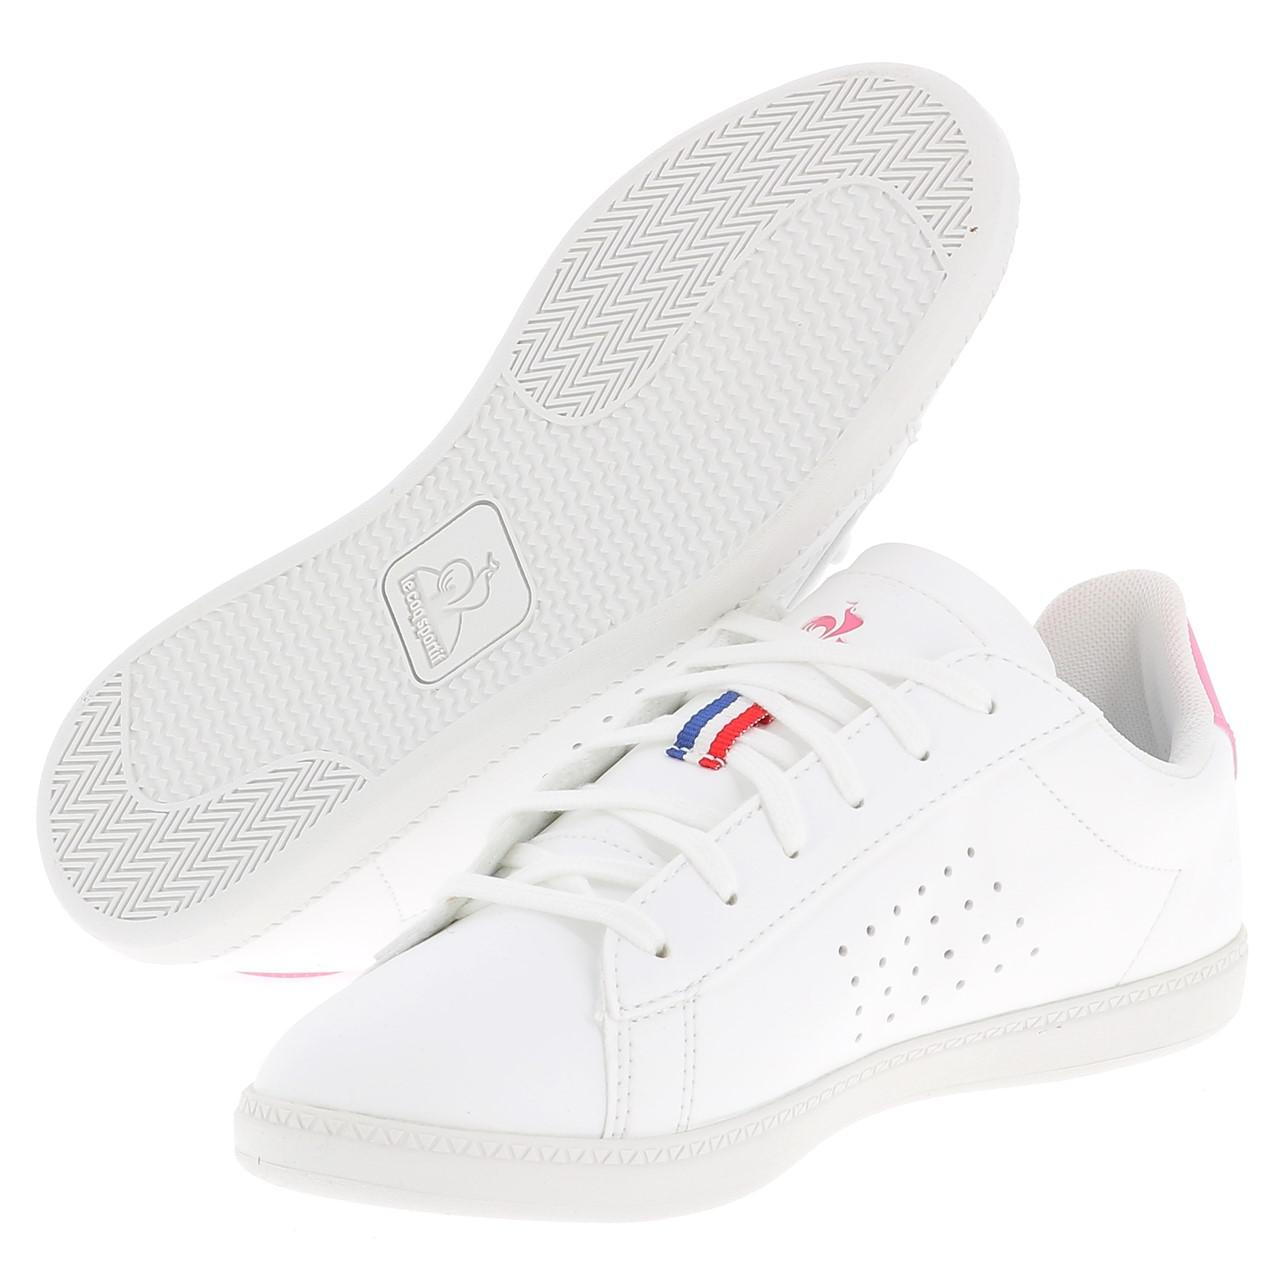 Schuhe-Niedrig-Leder-oder-Faux-Le-Coq-Sportif-Courtset-Maedchen-Blc-Weiss-47681 Indexbild 5